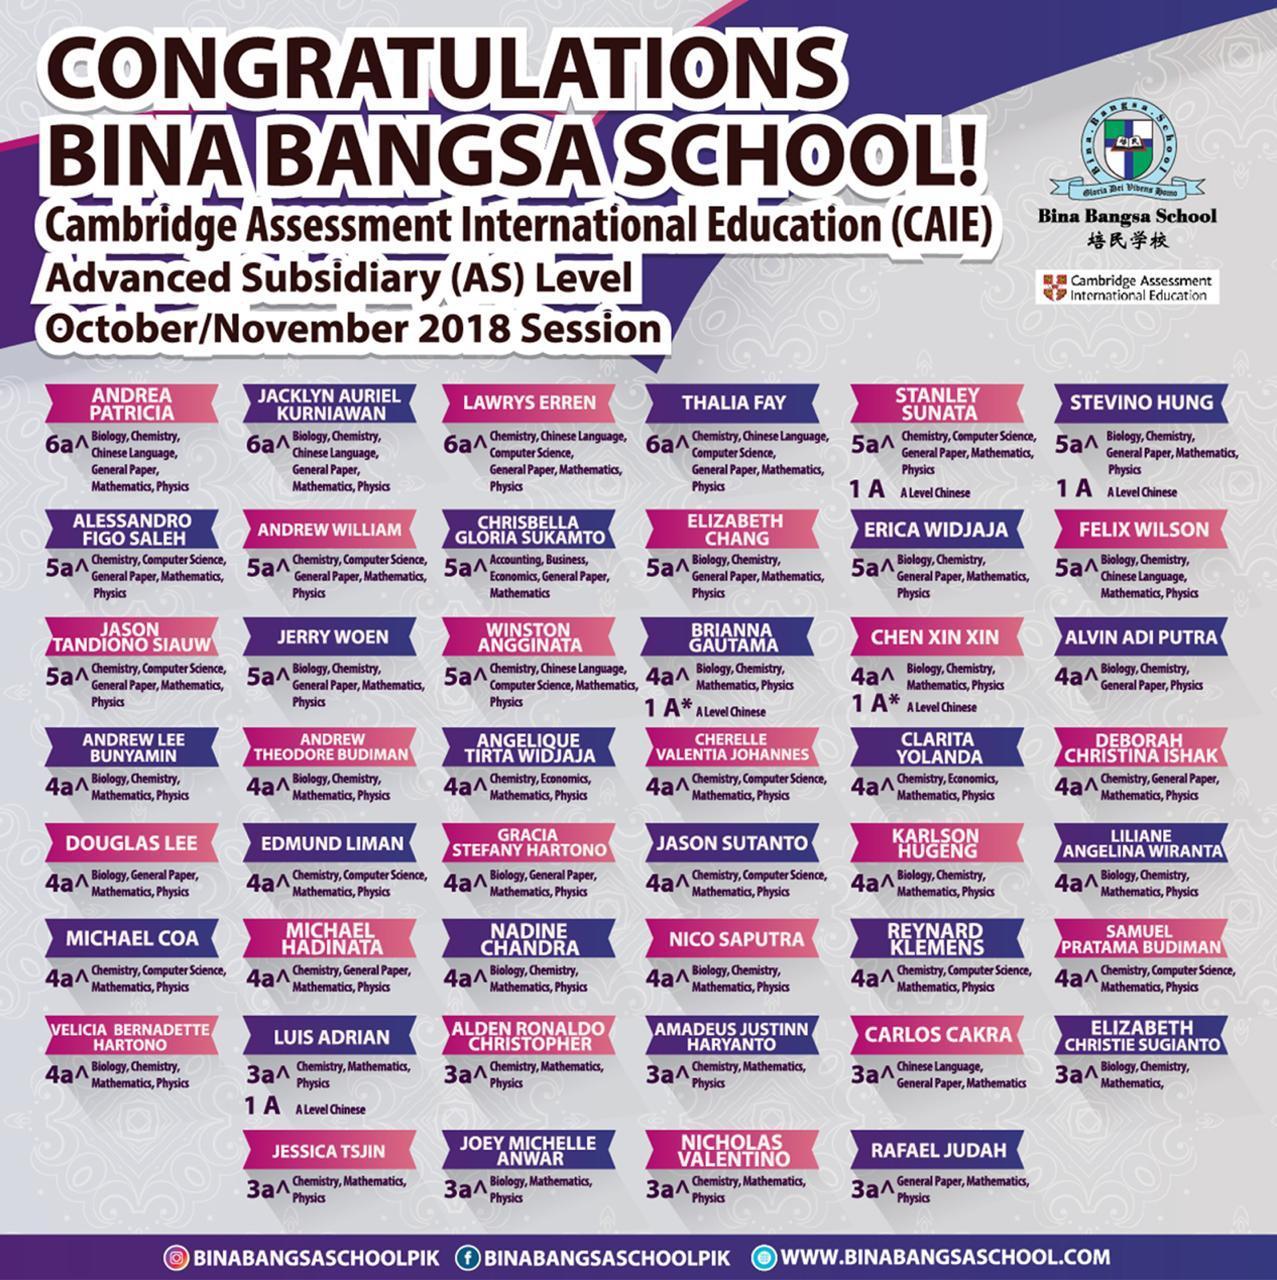 Cambridge Assessment International Education (CAIE) 2018